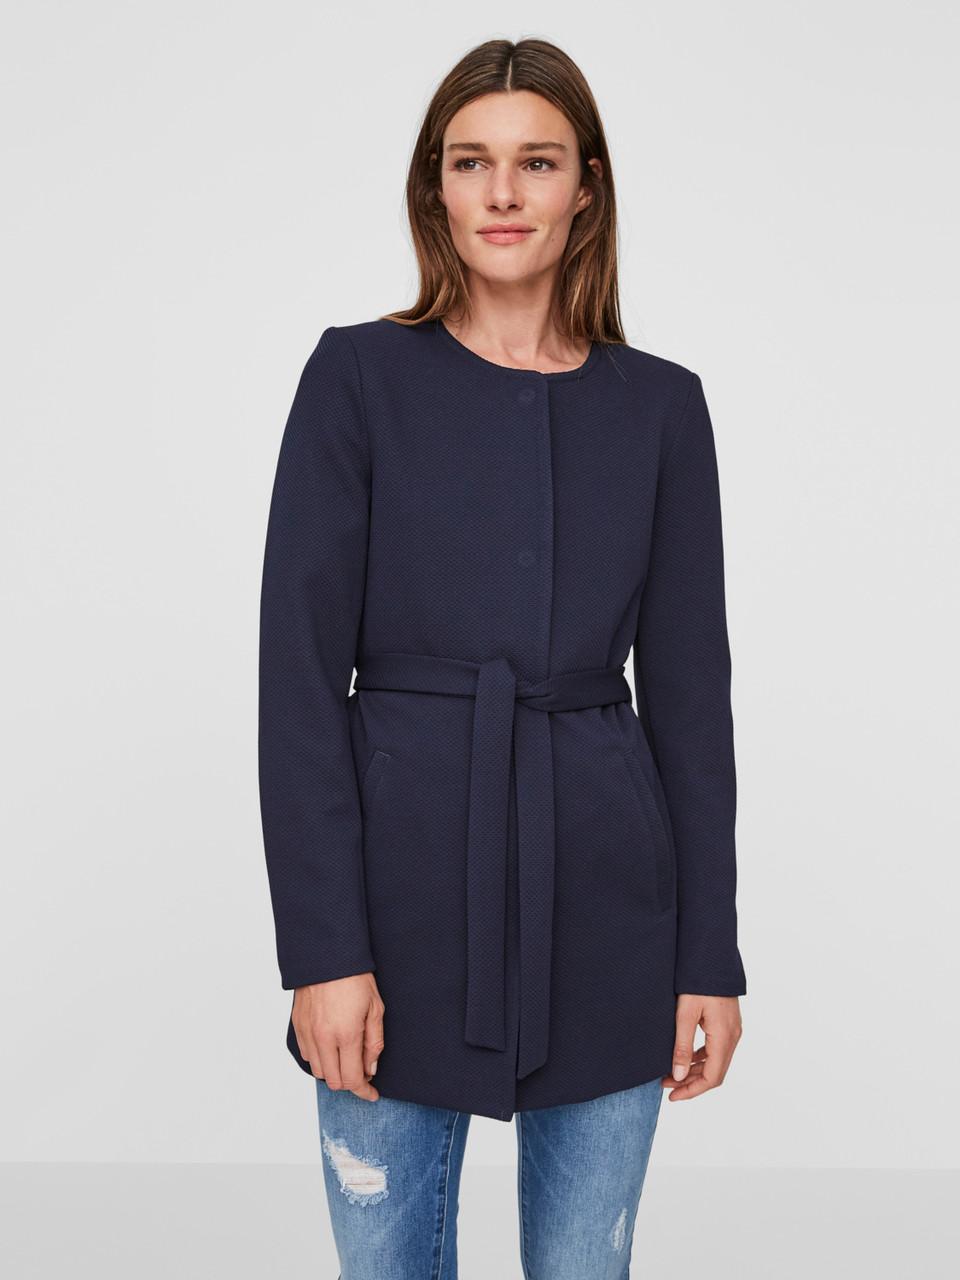 Пиджак Vero Moda 10196963 M Темно-синий